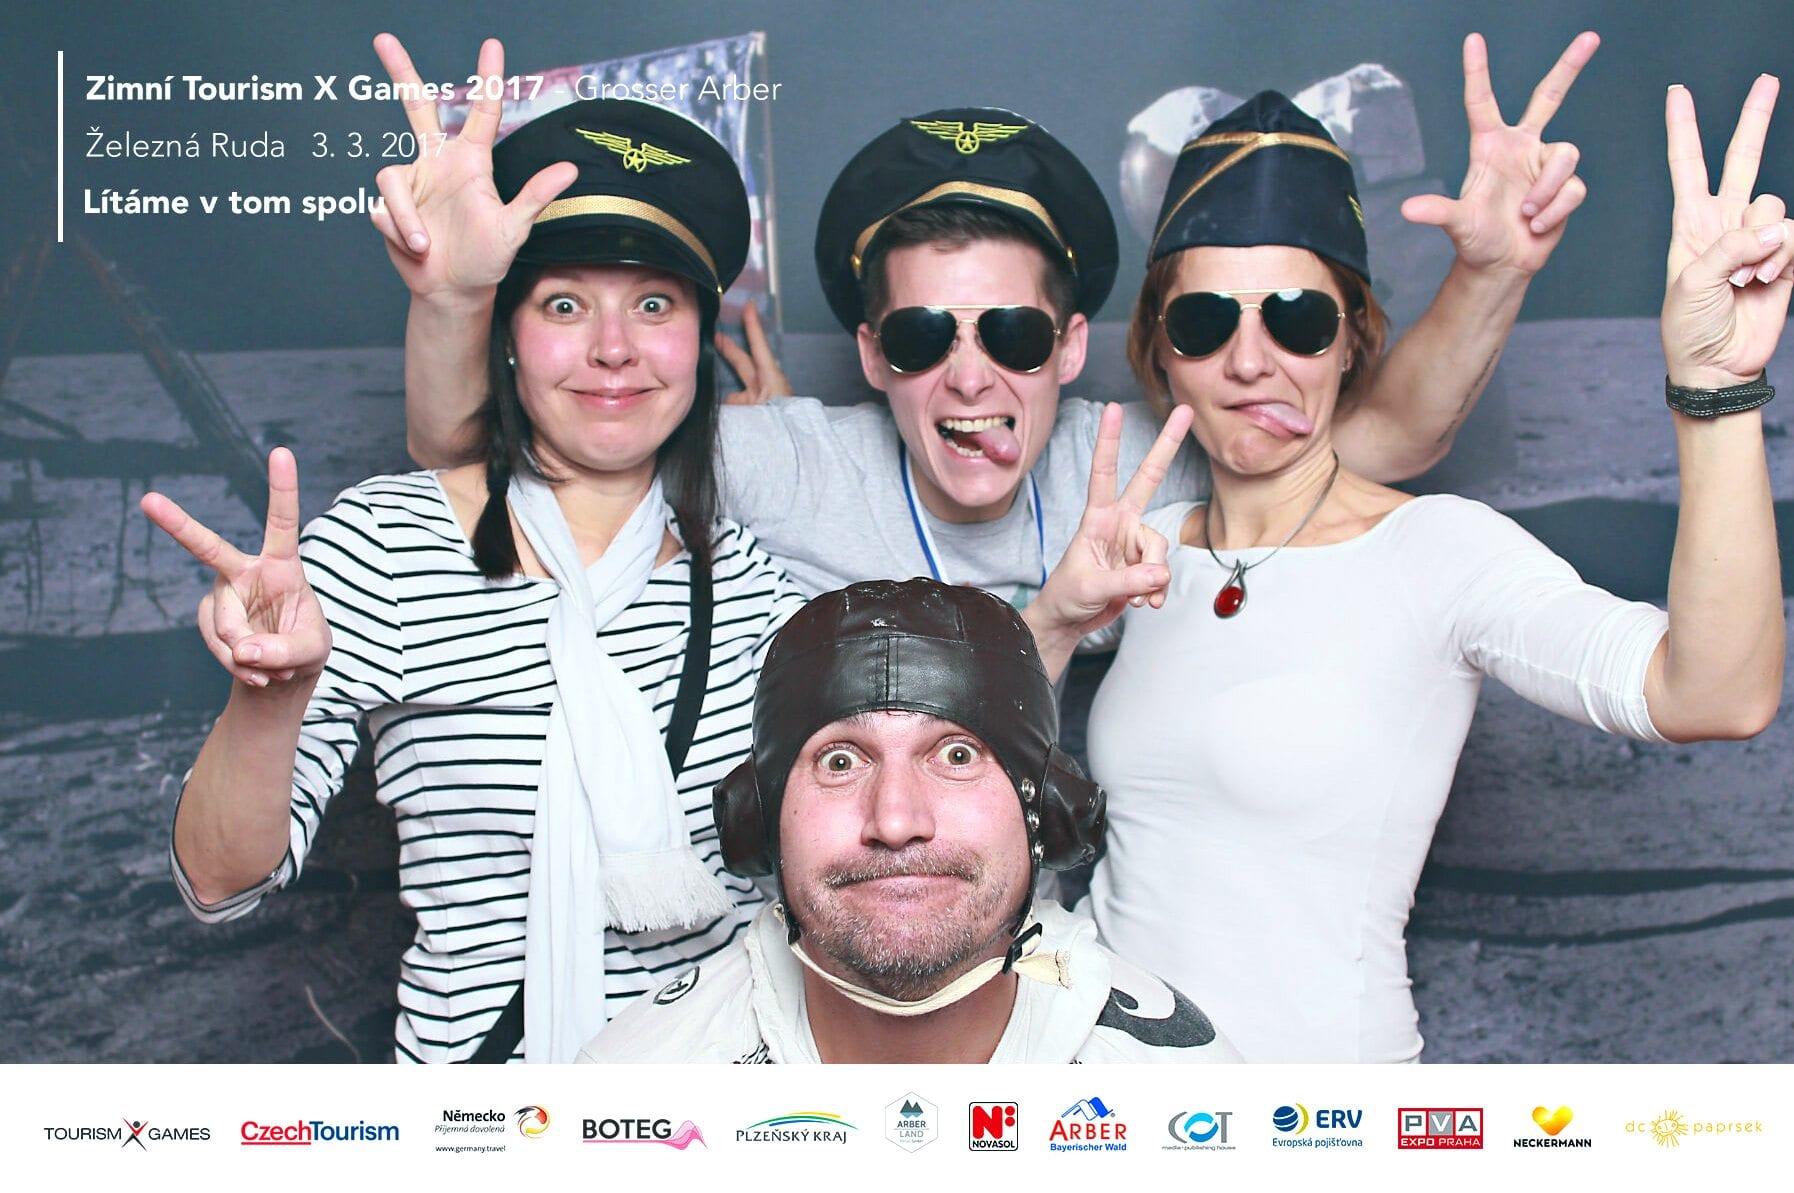 fotokoutek-zimni-tourism-x-games-3-3-2017-228016